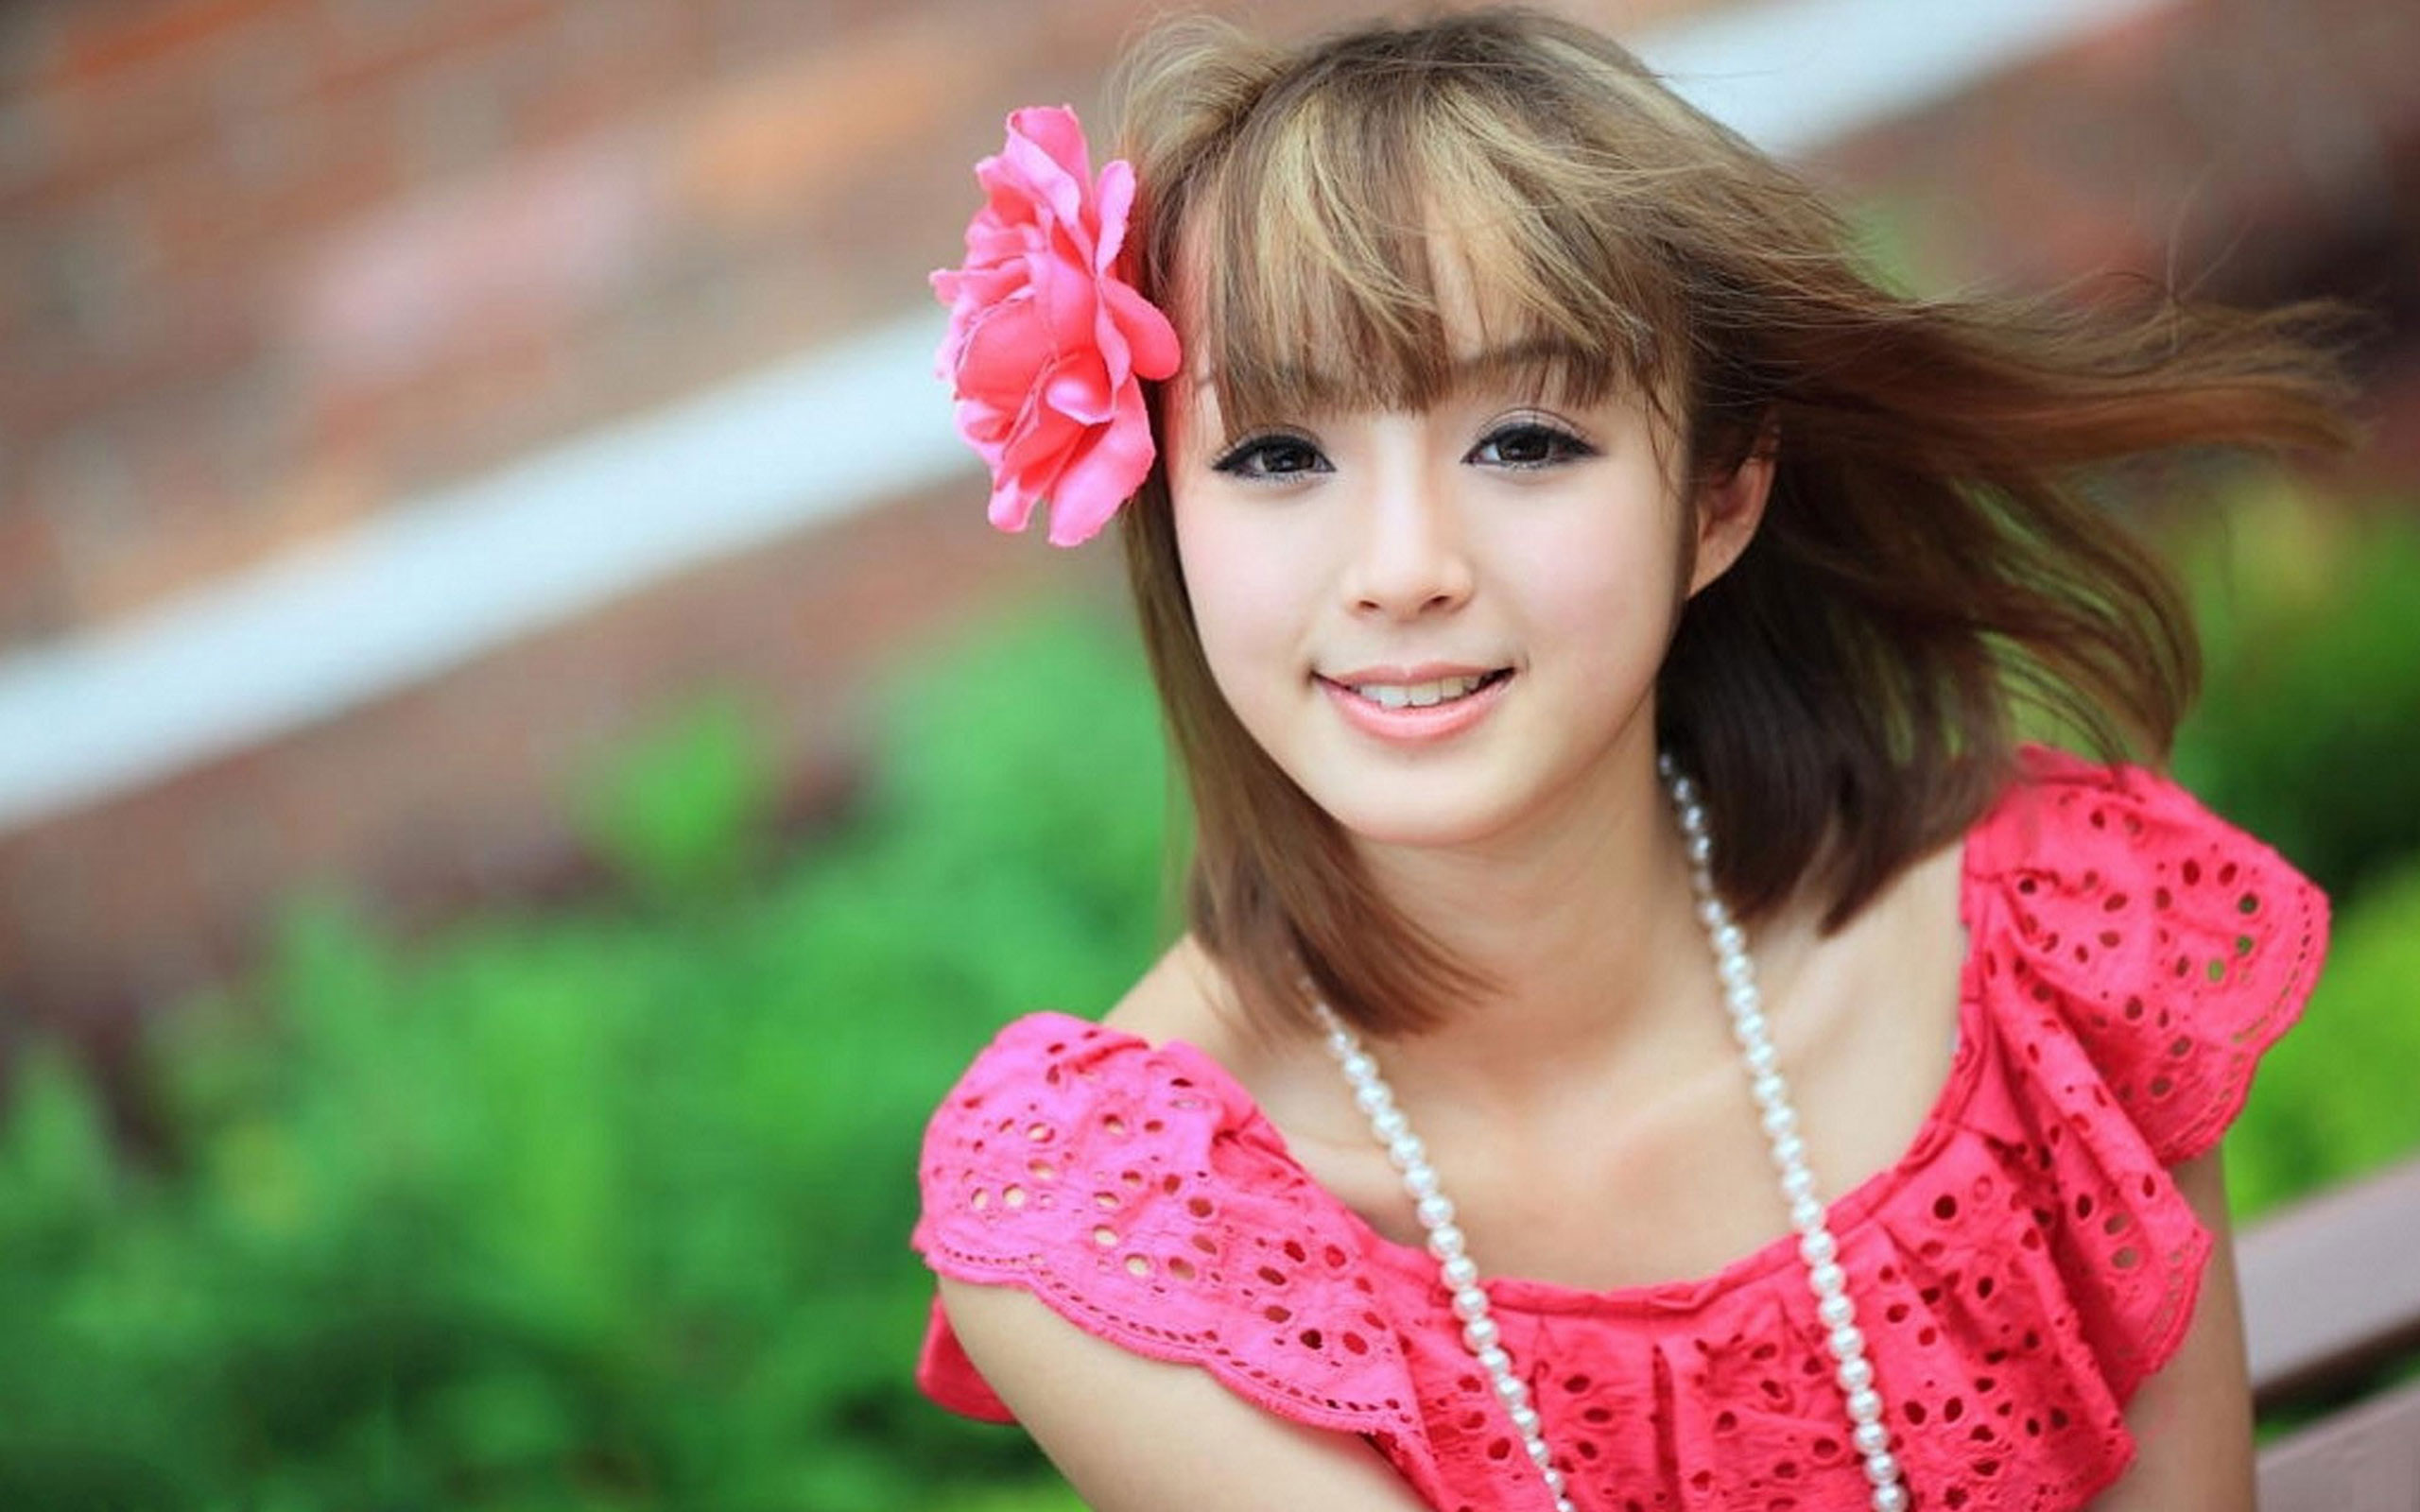 Cute Girl In Pink Dress #6940806